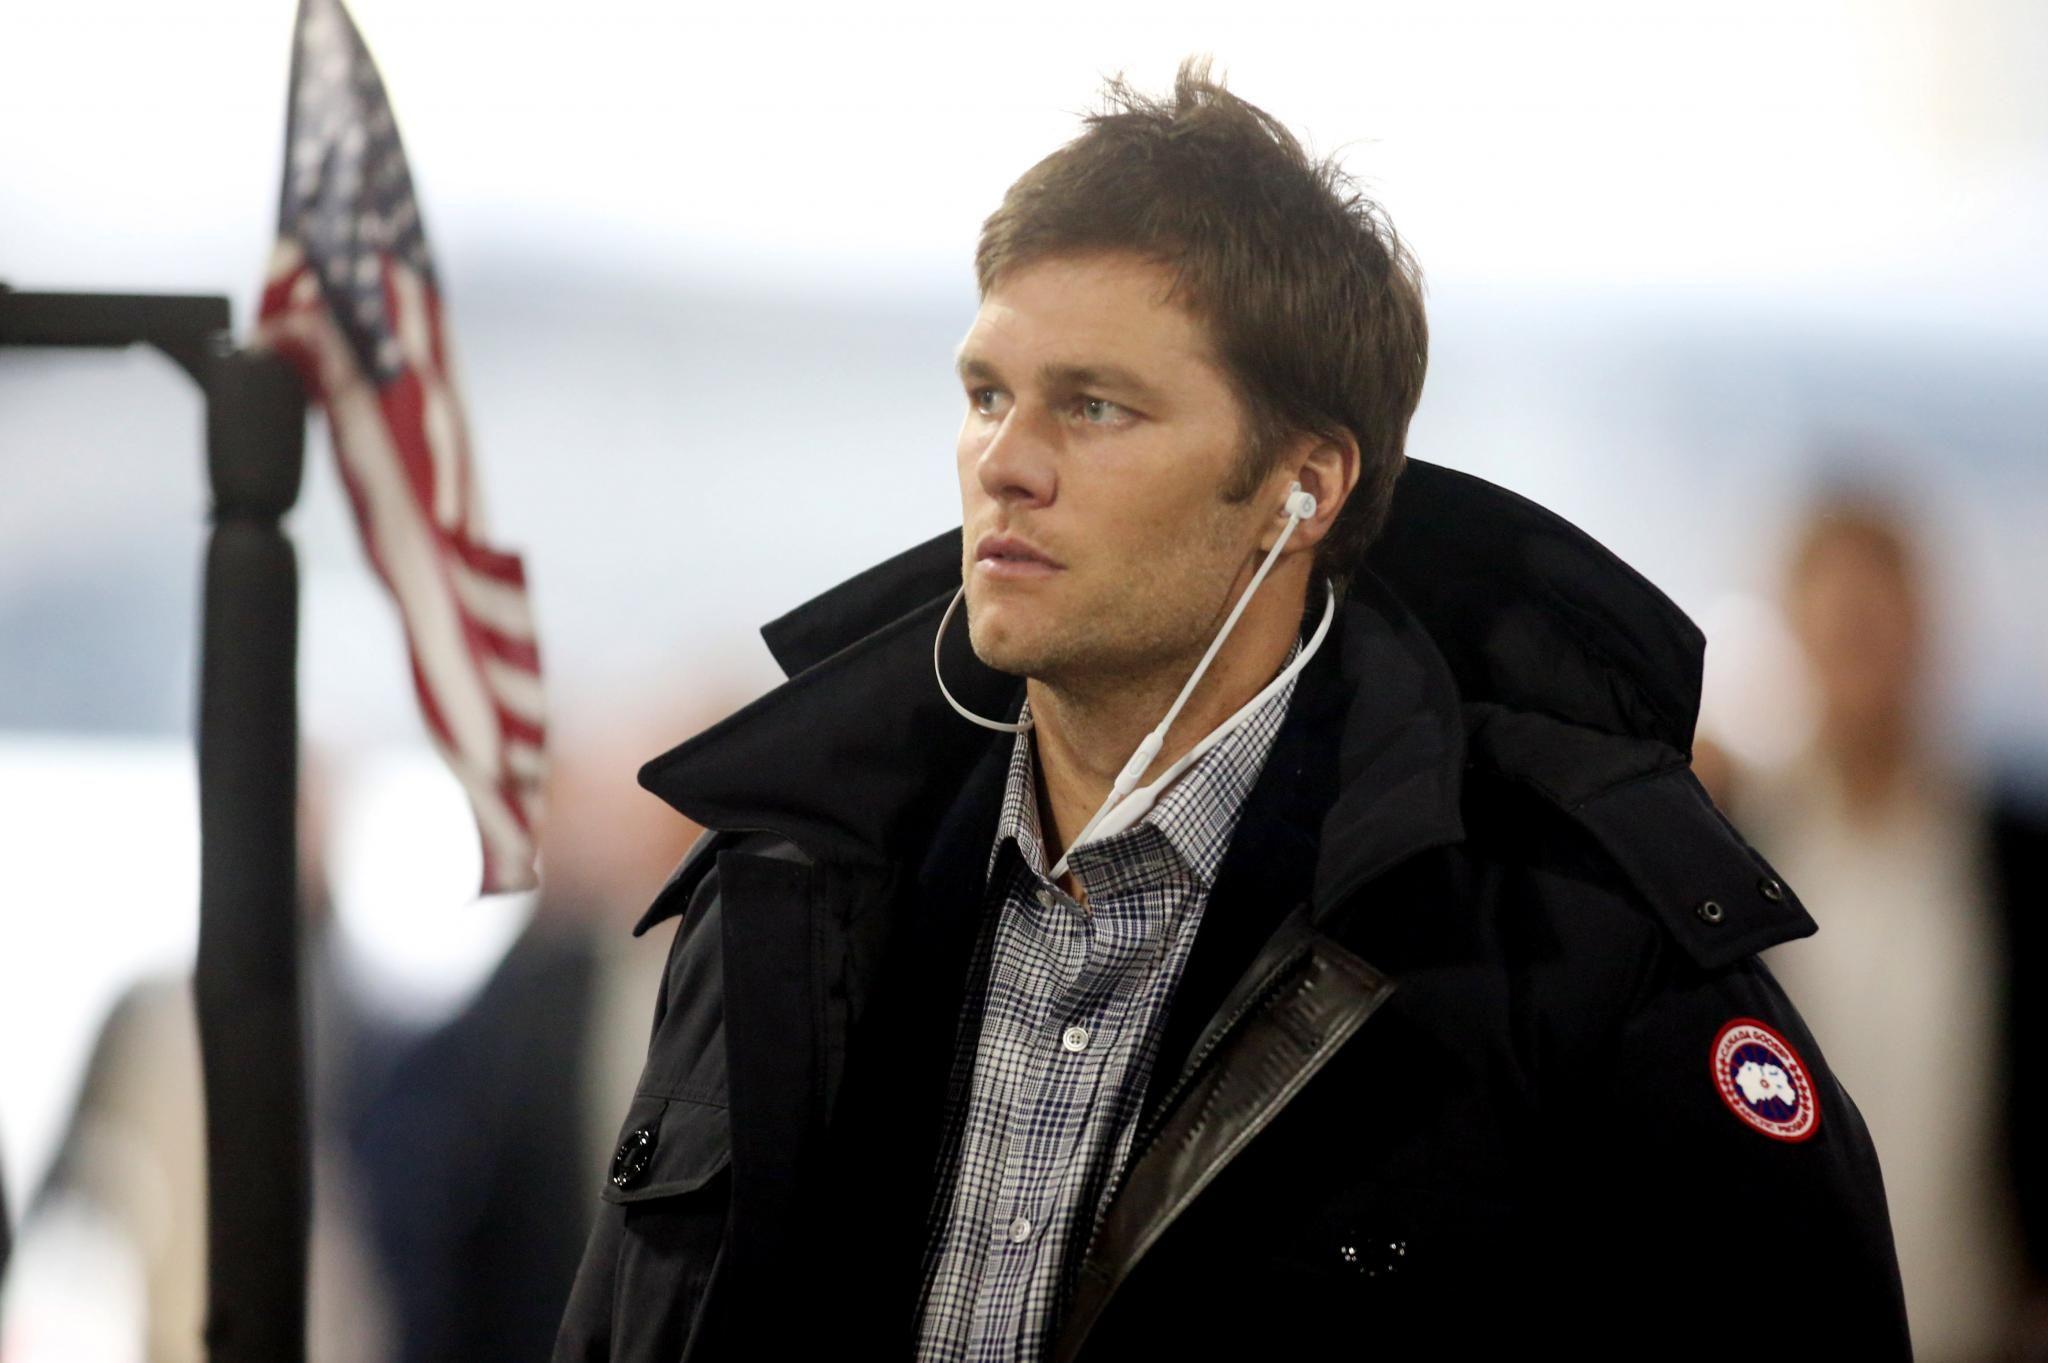 Tom Brady will be part of special 'Tom vs. Time